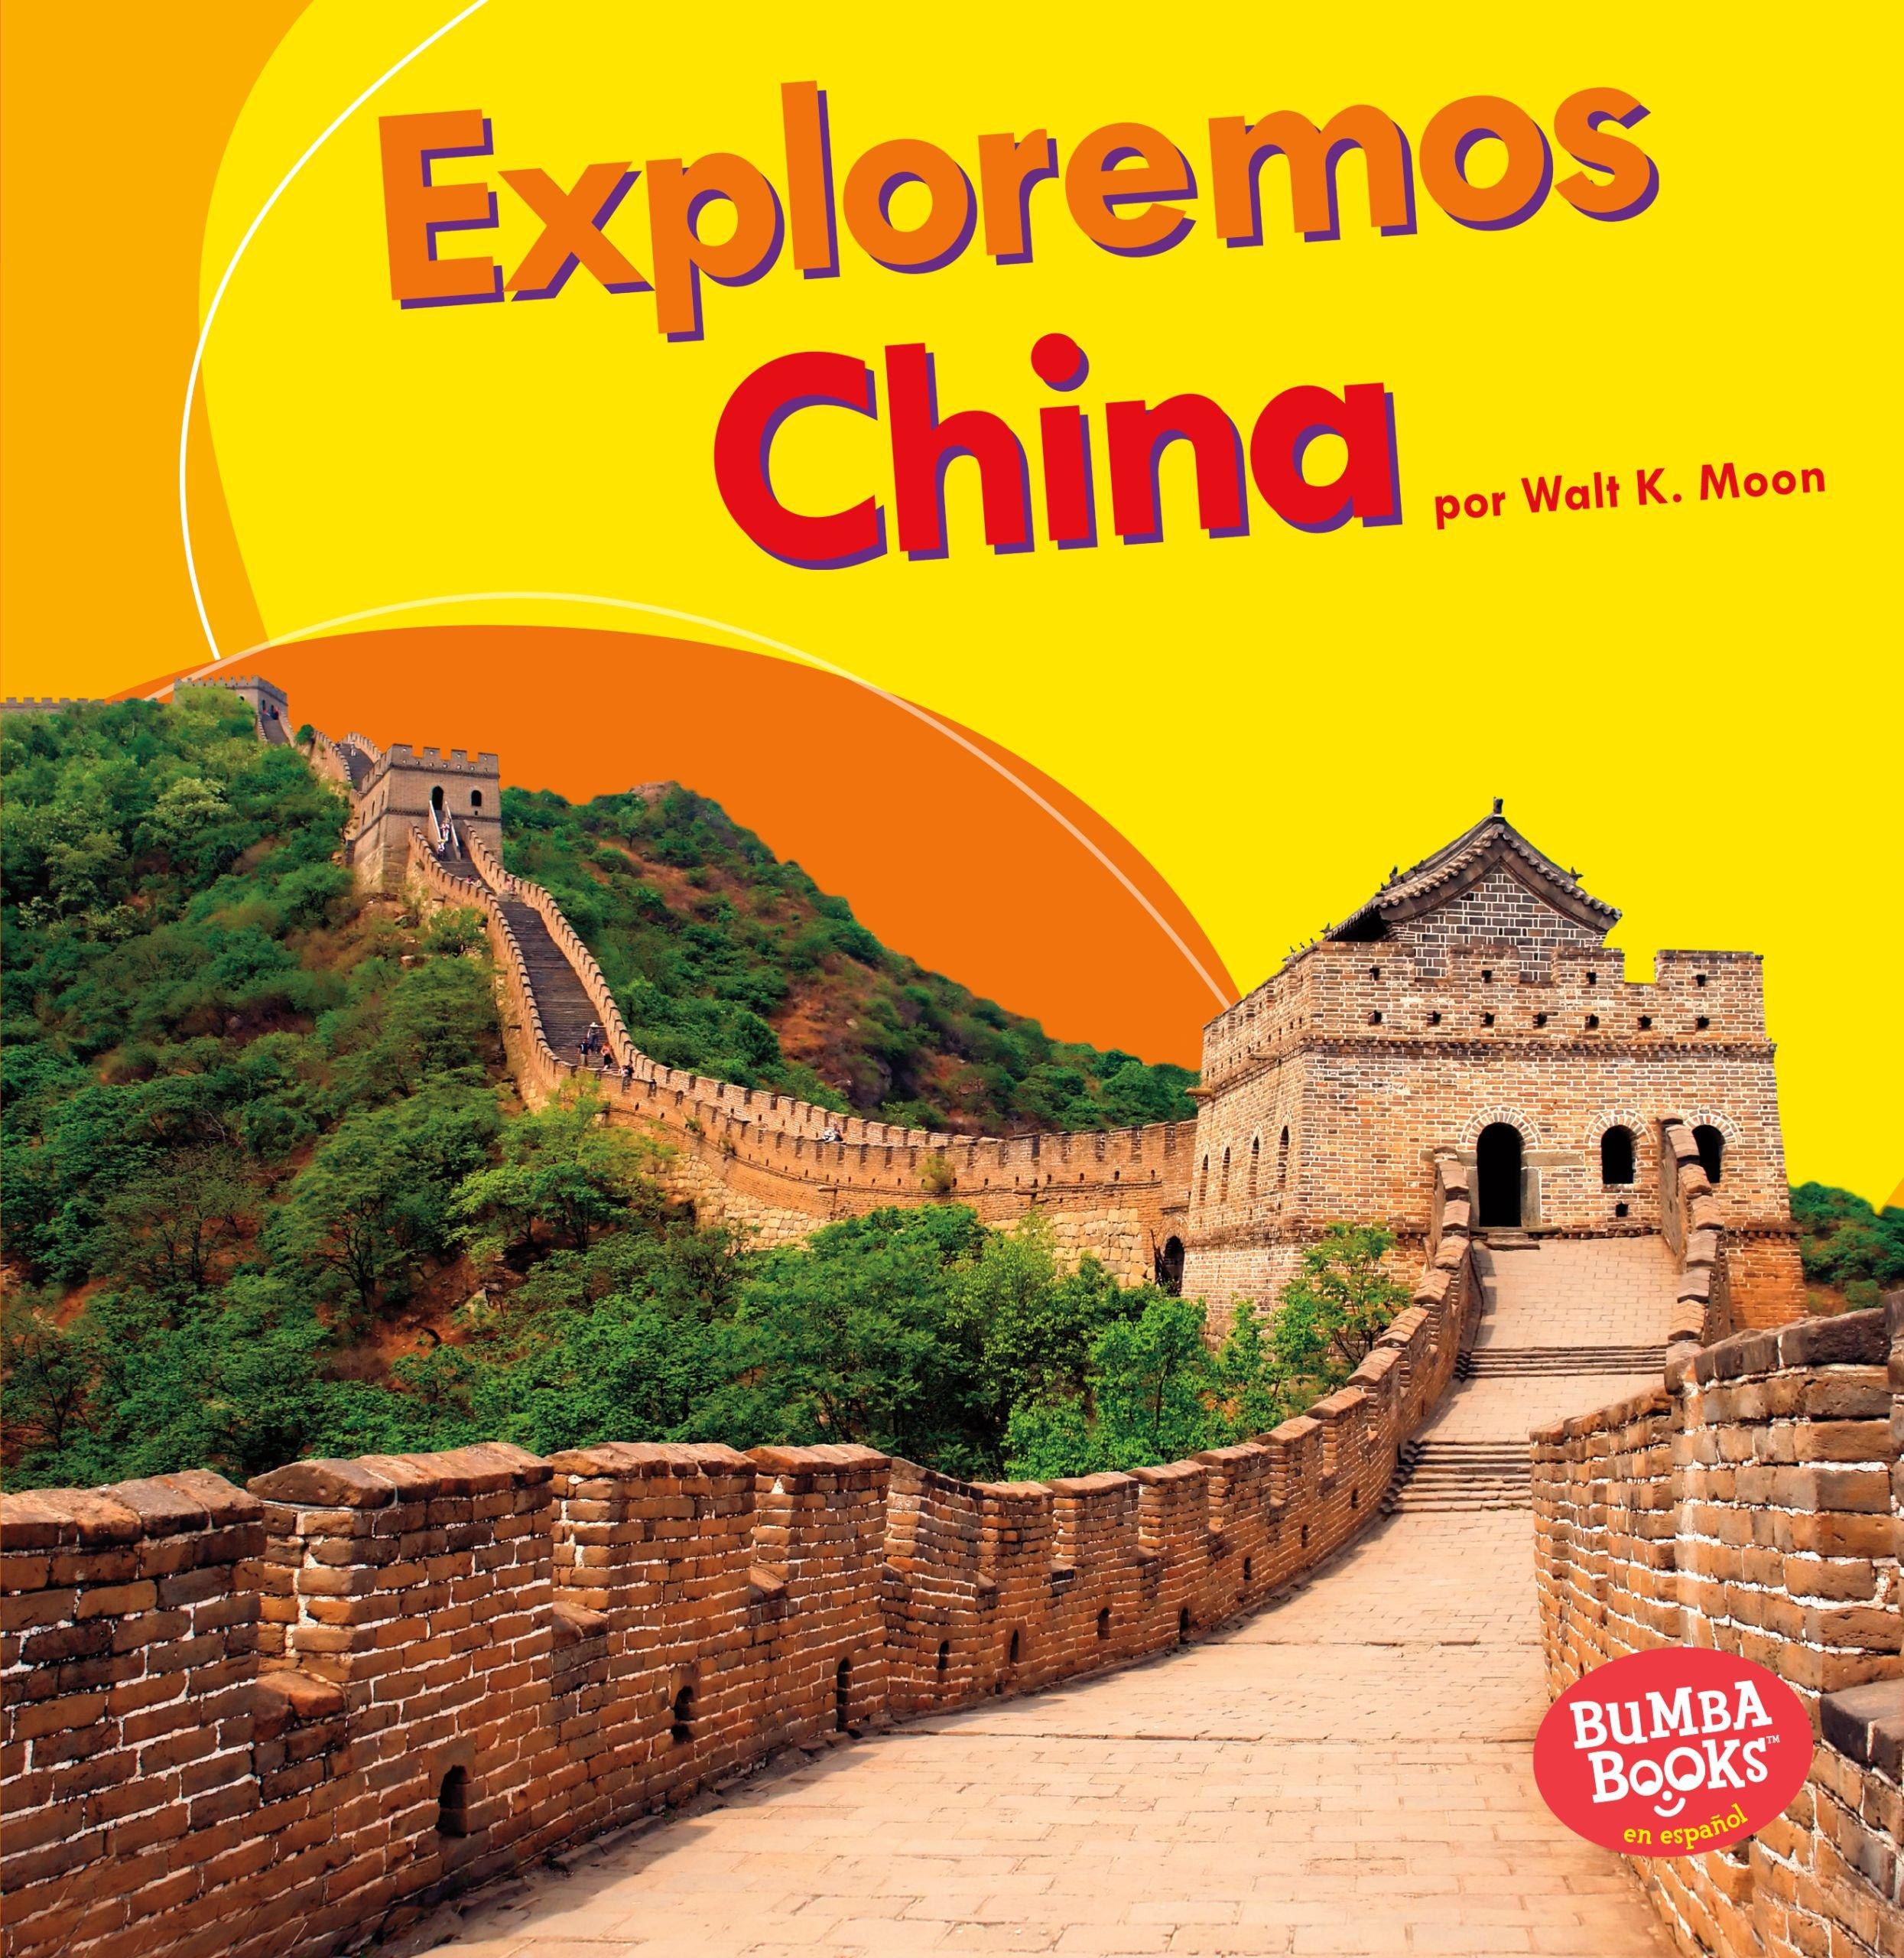 Read Online Exploremos China / Let's Explore China (Exploremos Países / Let's Explore Countries) (Spanish Edition) (Bumba books en espanol: Exploremos países / Let's Explore Countries) PDF